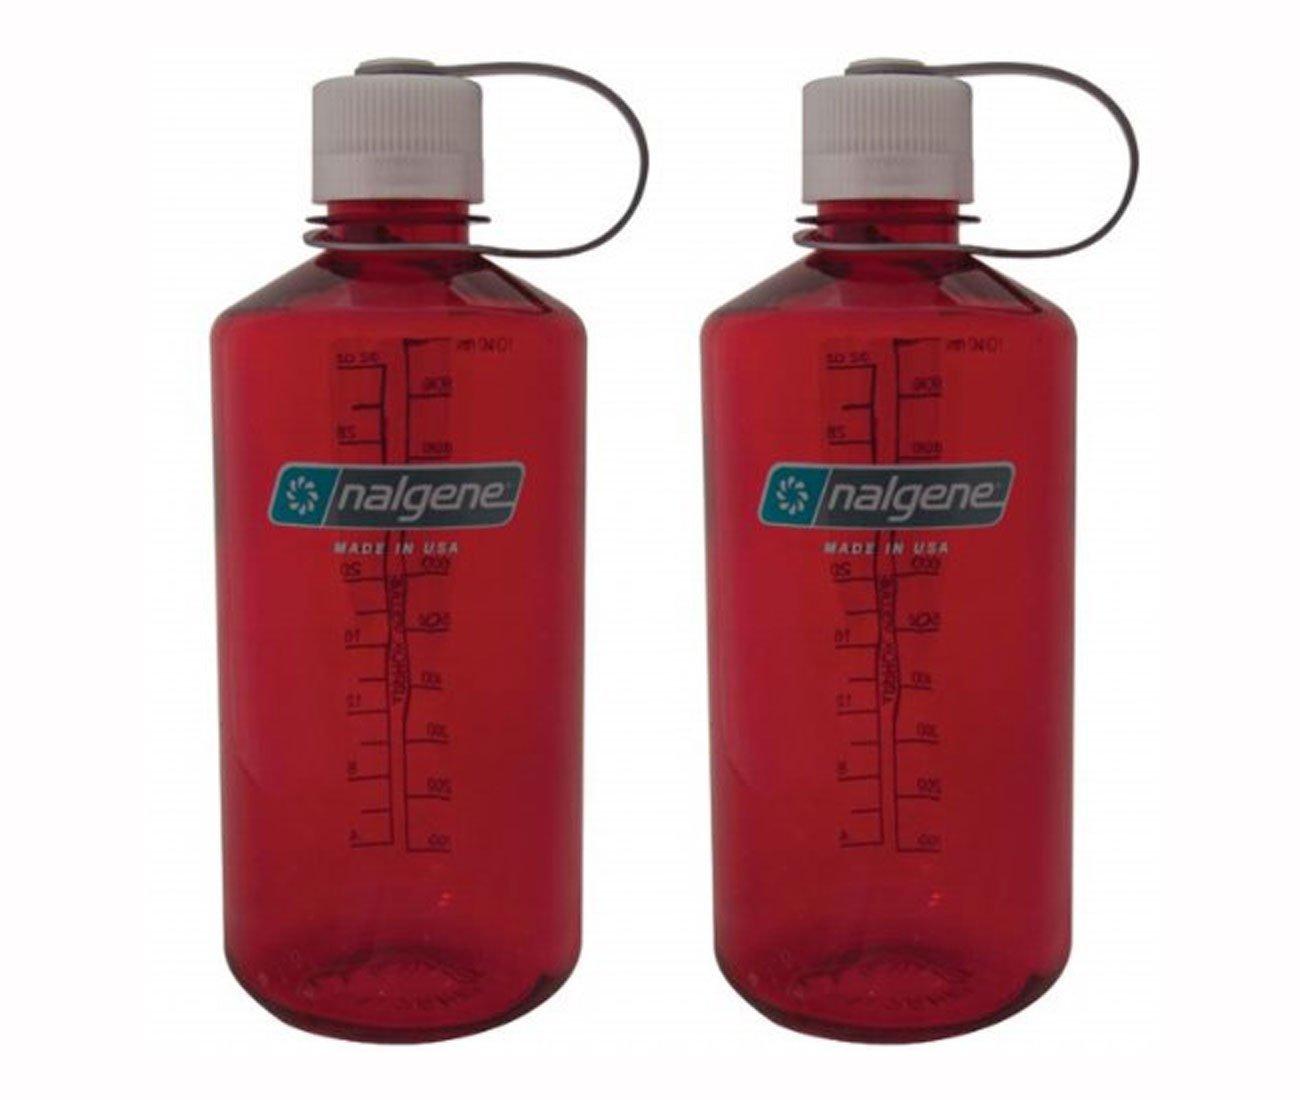 32oz Nalgene Tritan Narrow Mouth BPA-Free Water Bottle 1-Quart